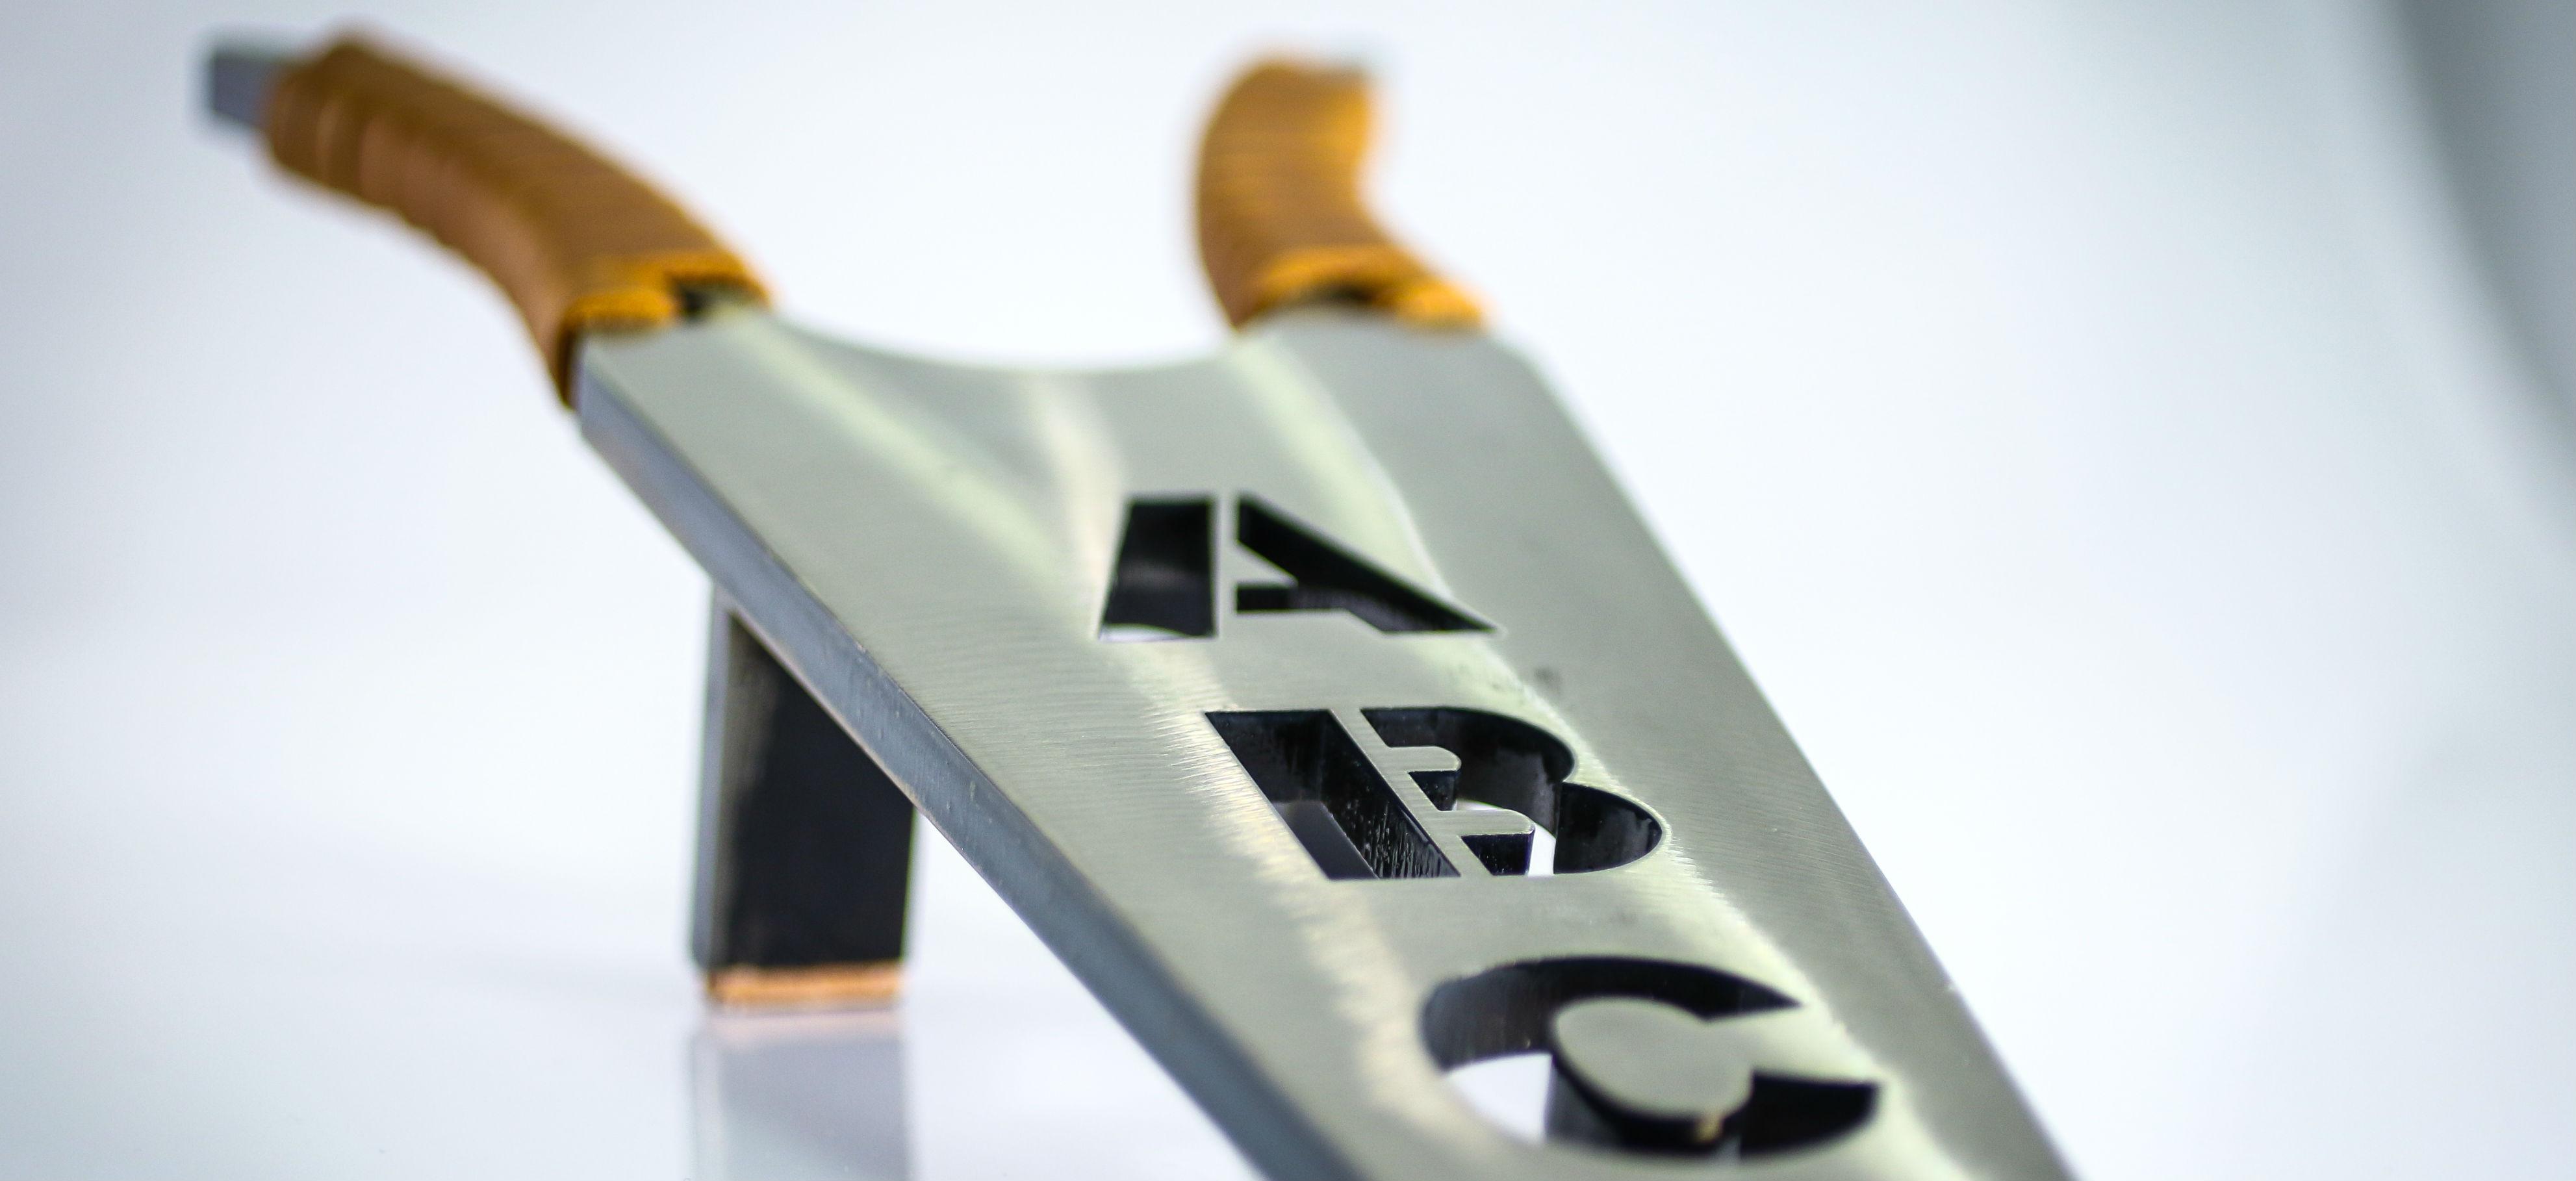 closeup of a custom made, high polished, metal boot jack